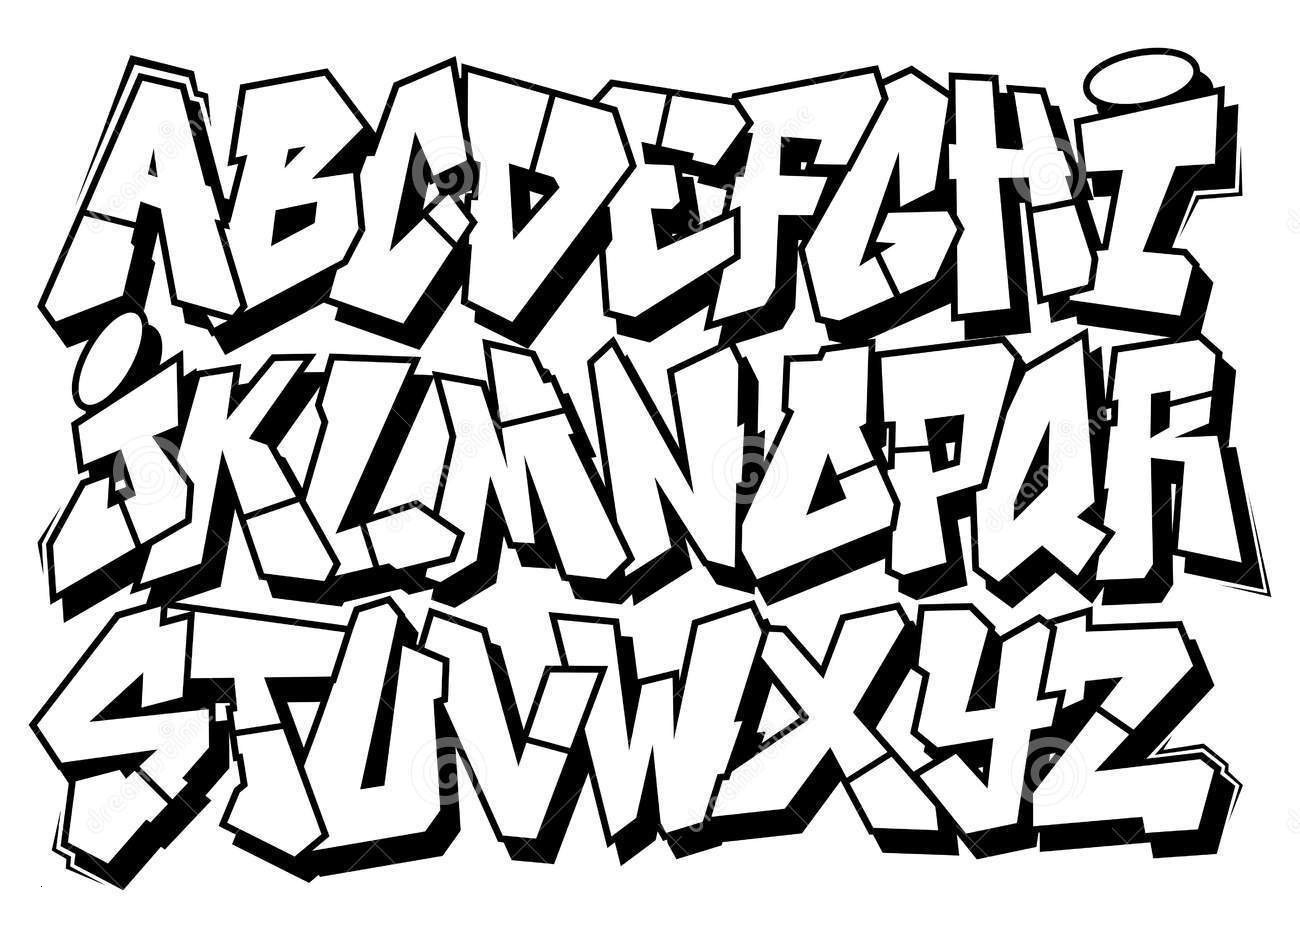 Coole Ausmalbilder Graffiti Genial Ausmalbilder Graffiti Love Schön 40 Regenbogenfisch Ausmalbilder Fotografieren